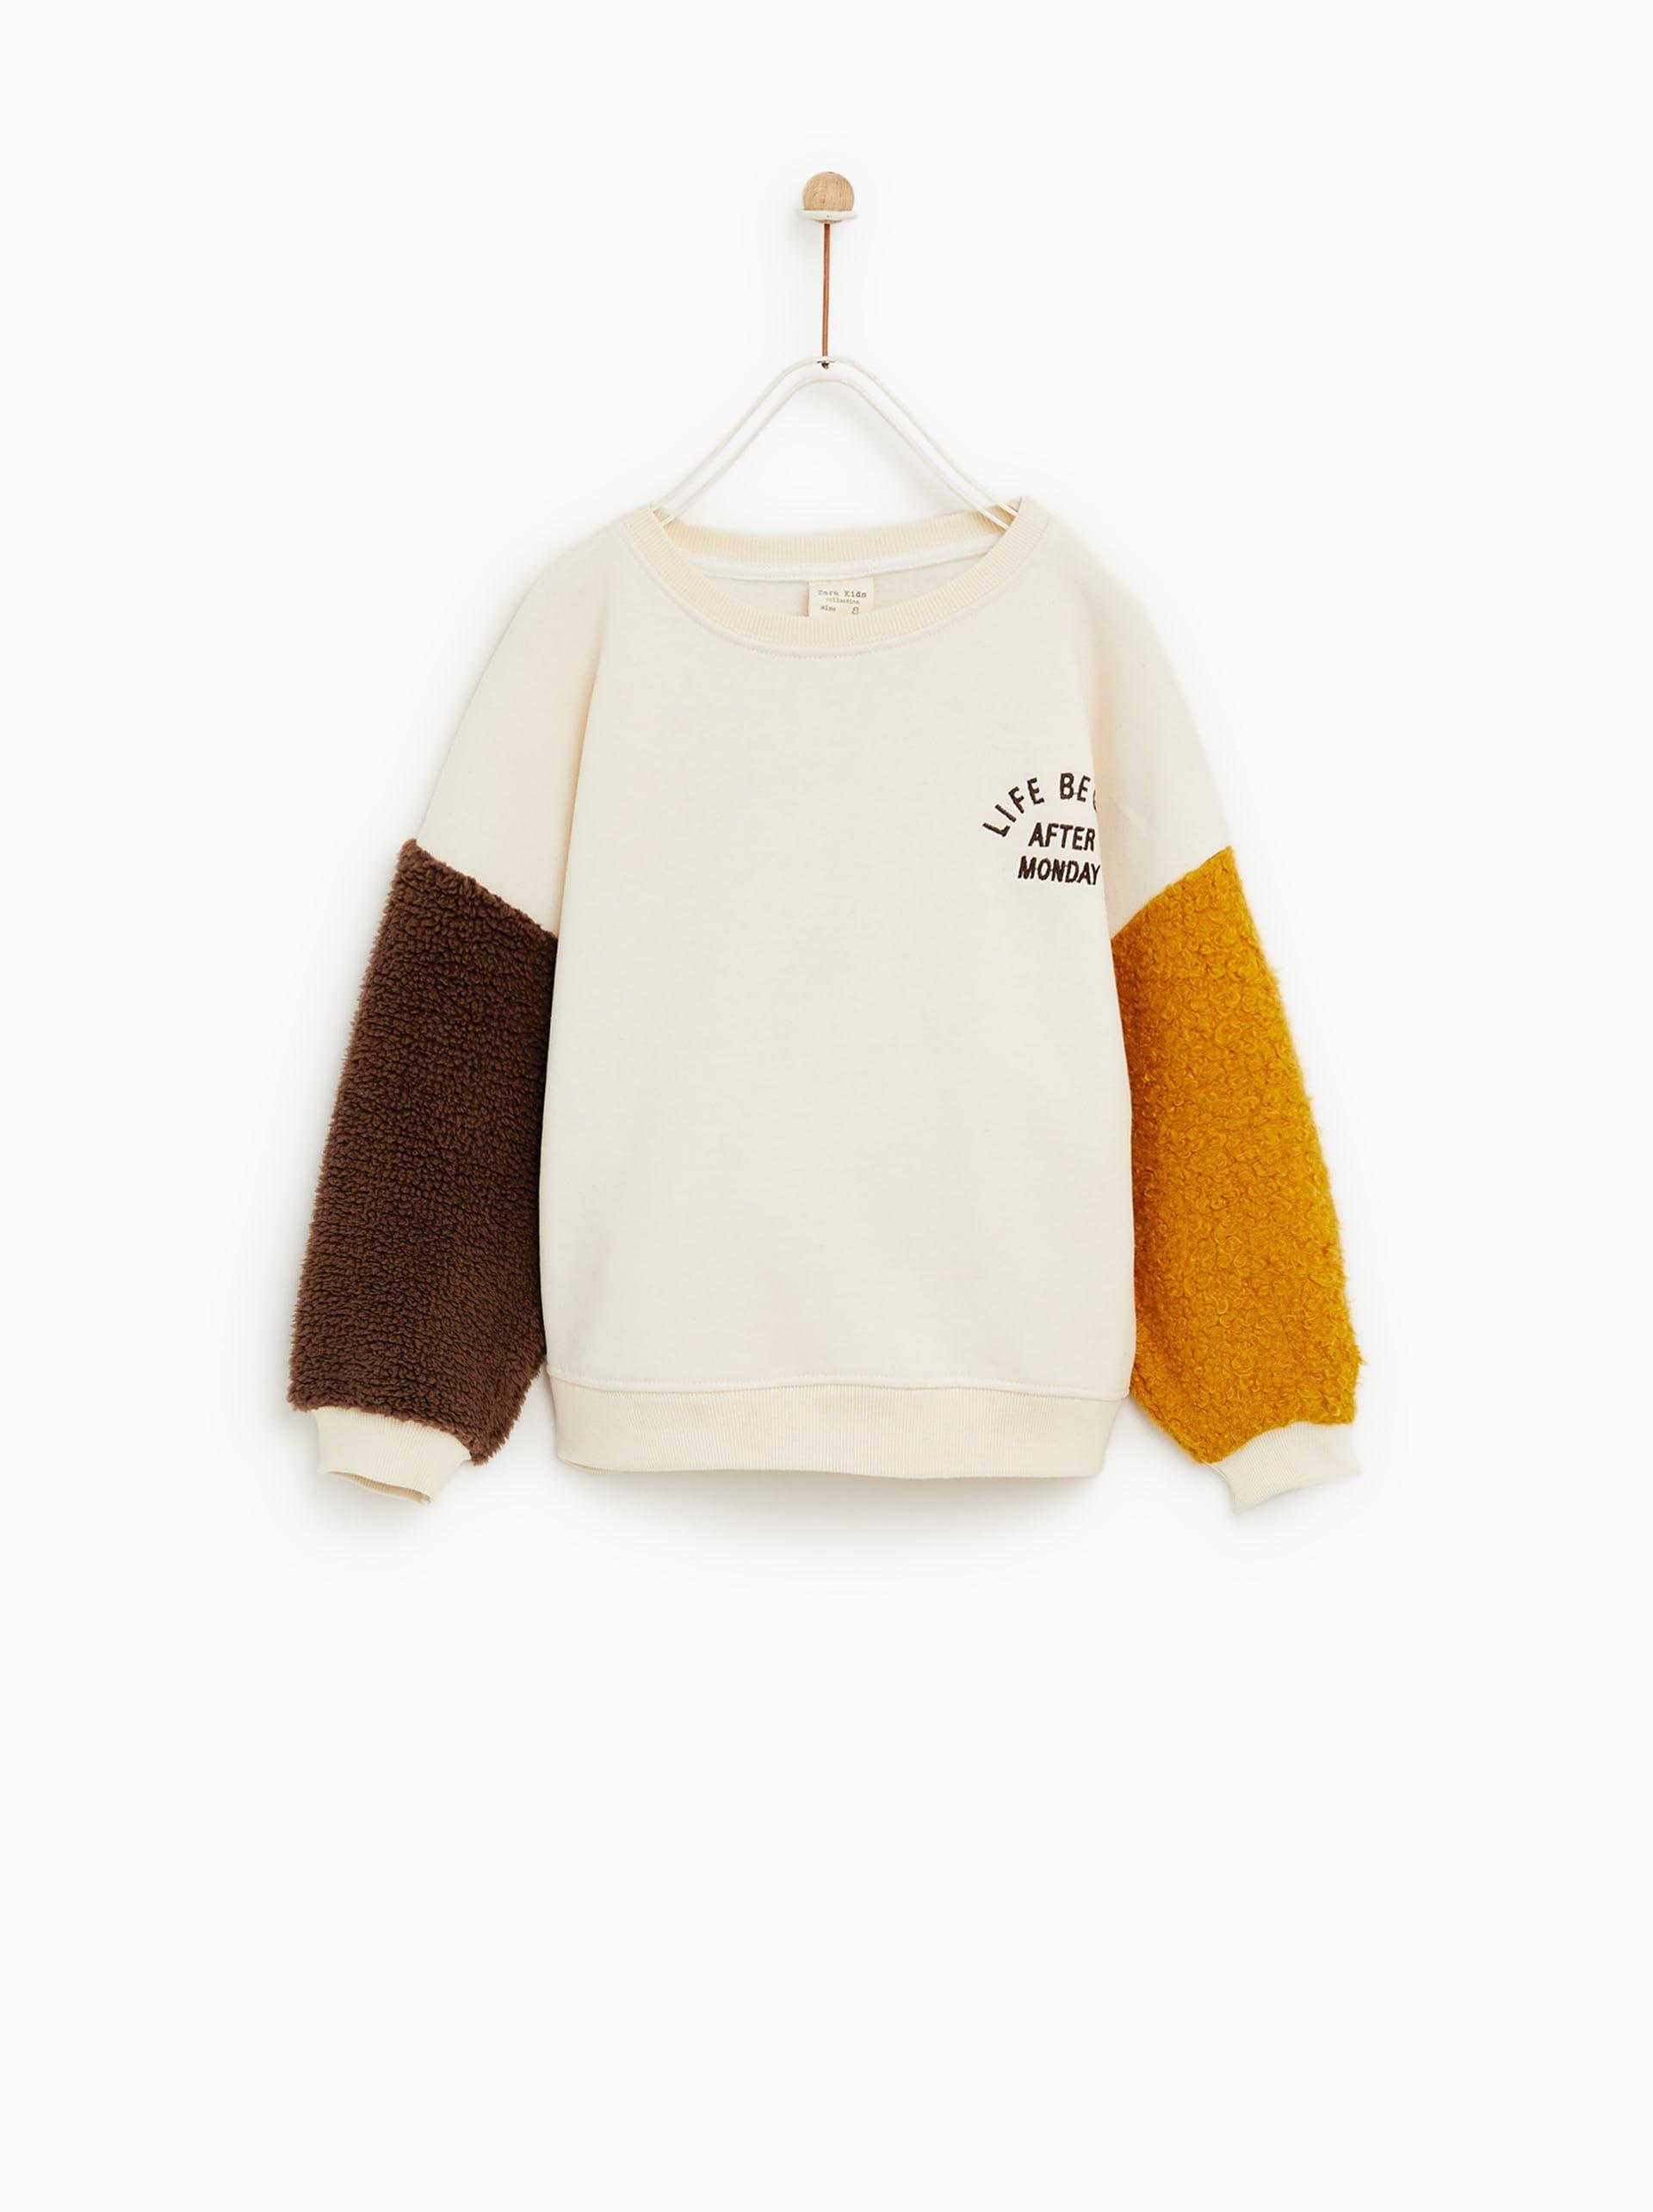 Sweatshirt with faux shearling sleeves | Zara kids, Girls ...